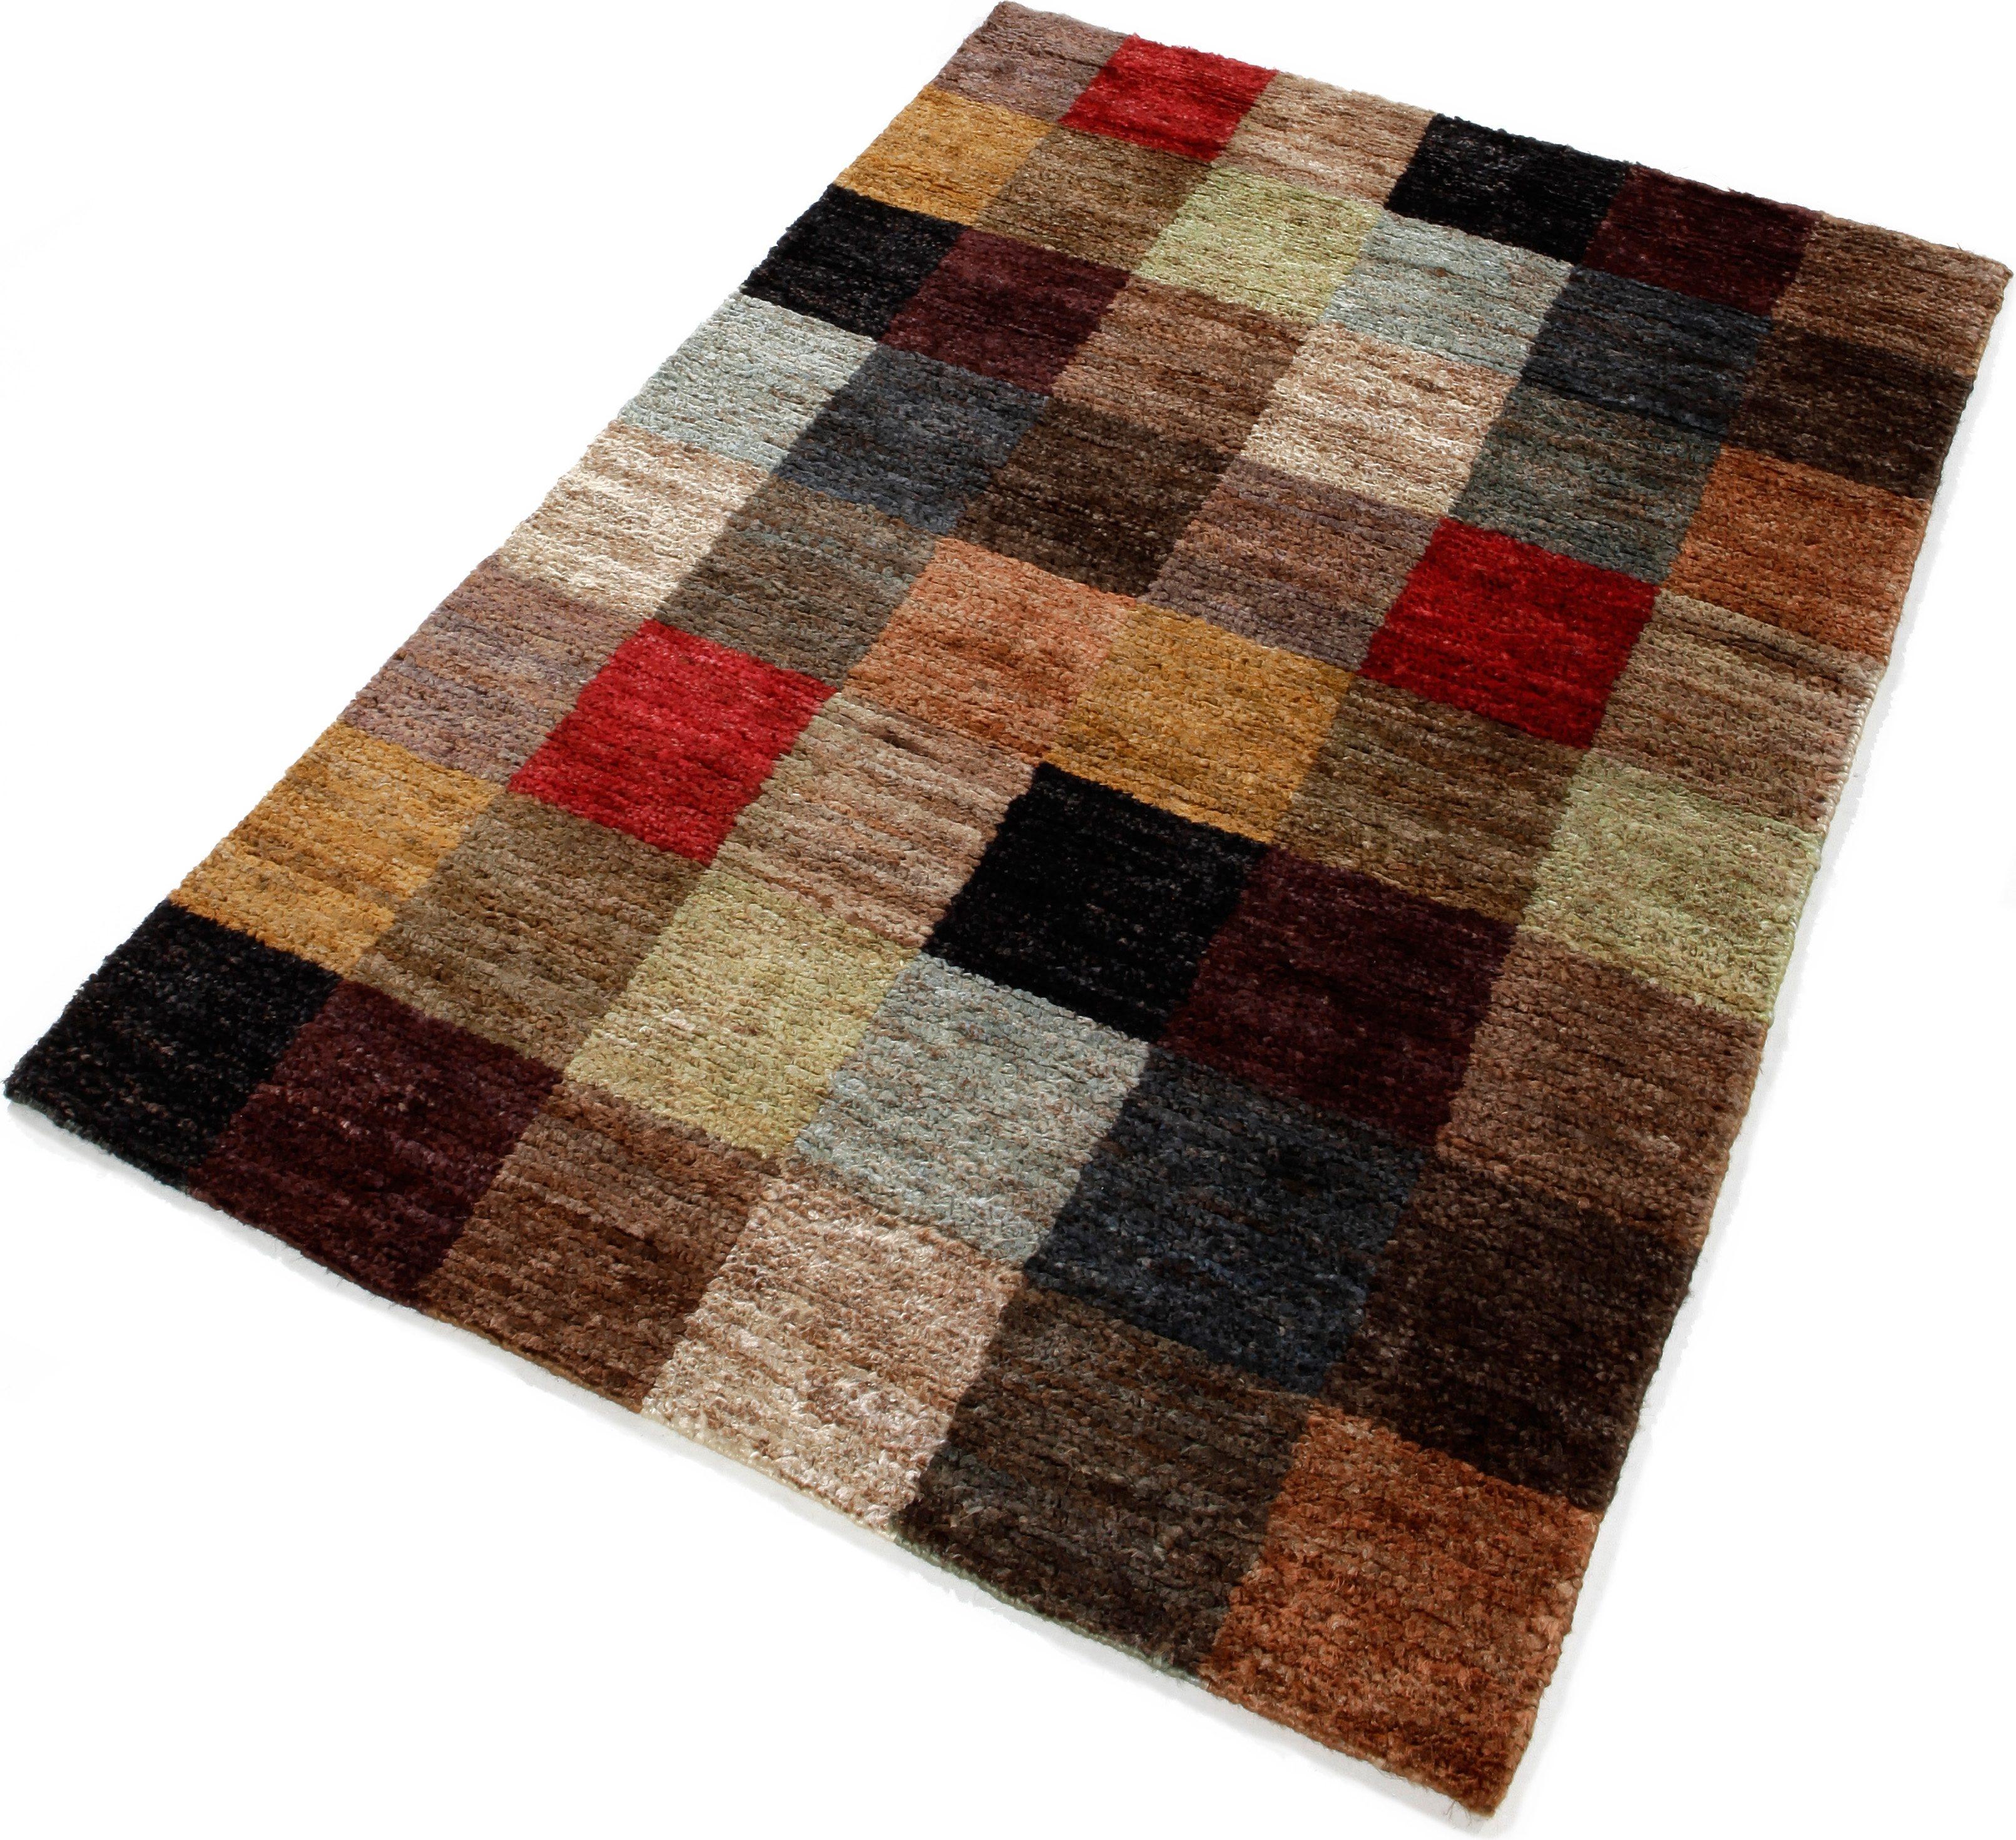 Teppich Diamond Home affaire rechteckig Höhe 10 mm